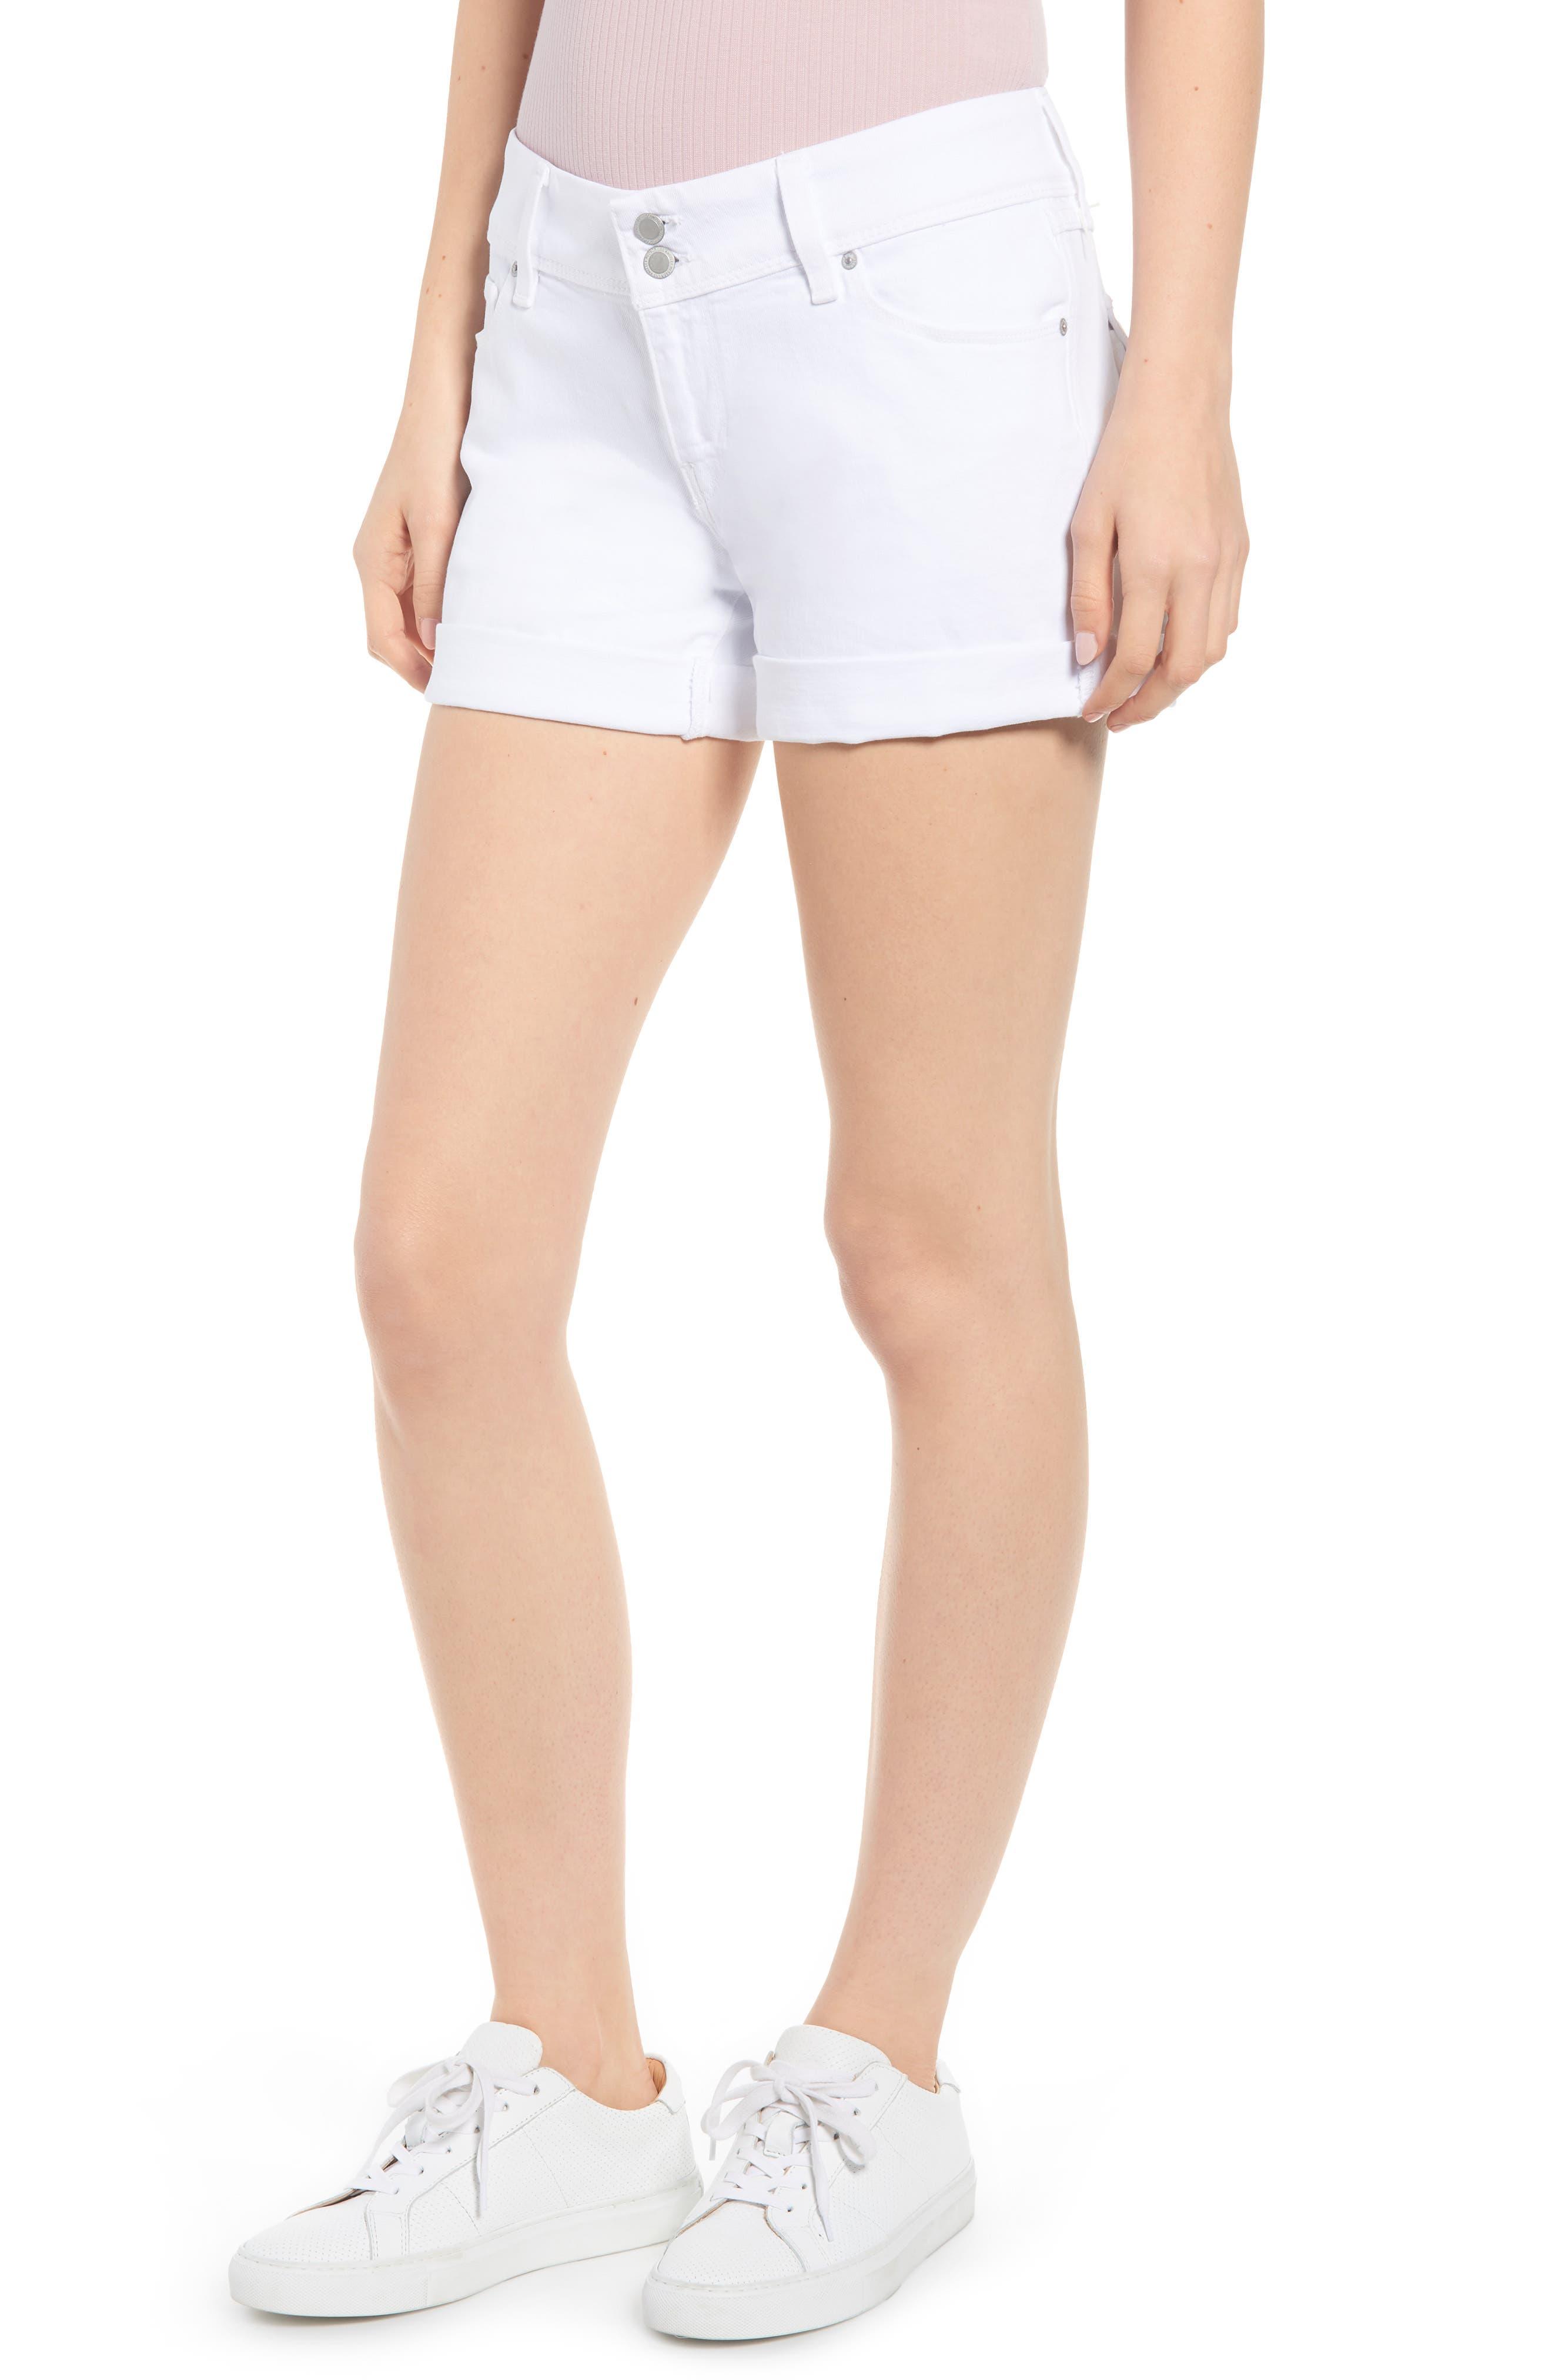 HUDSON JEANS, Croxley Cuff Denim Shorts, Main thumbnail 1, color, WHITE 2